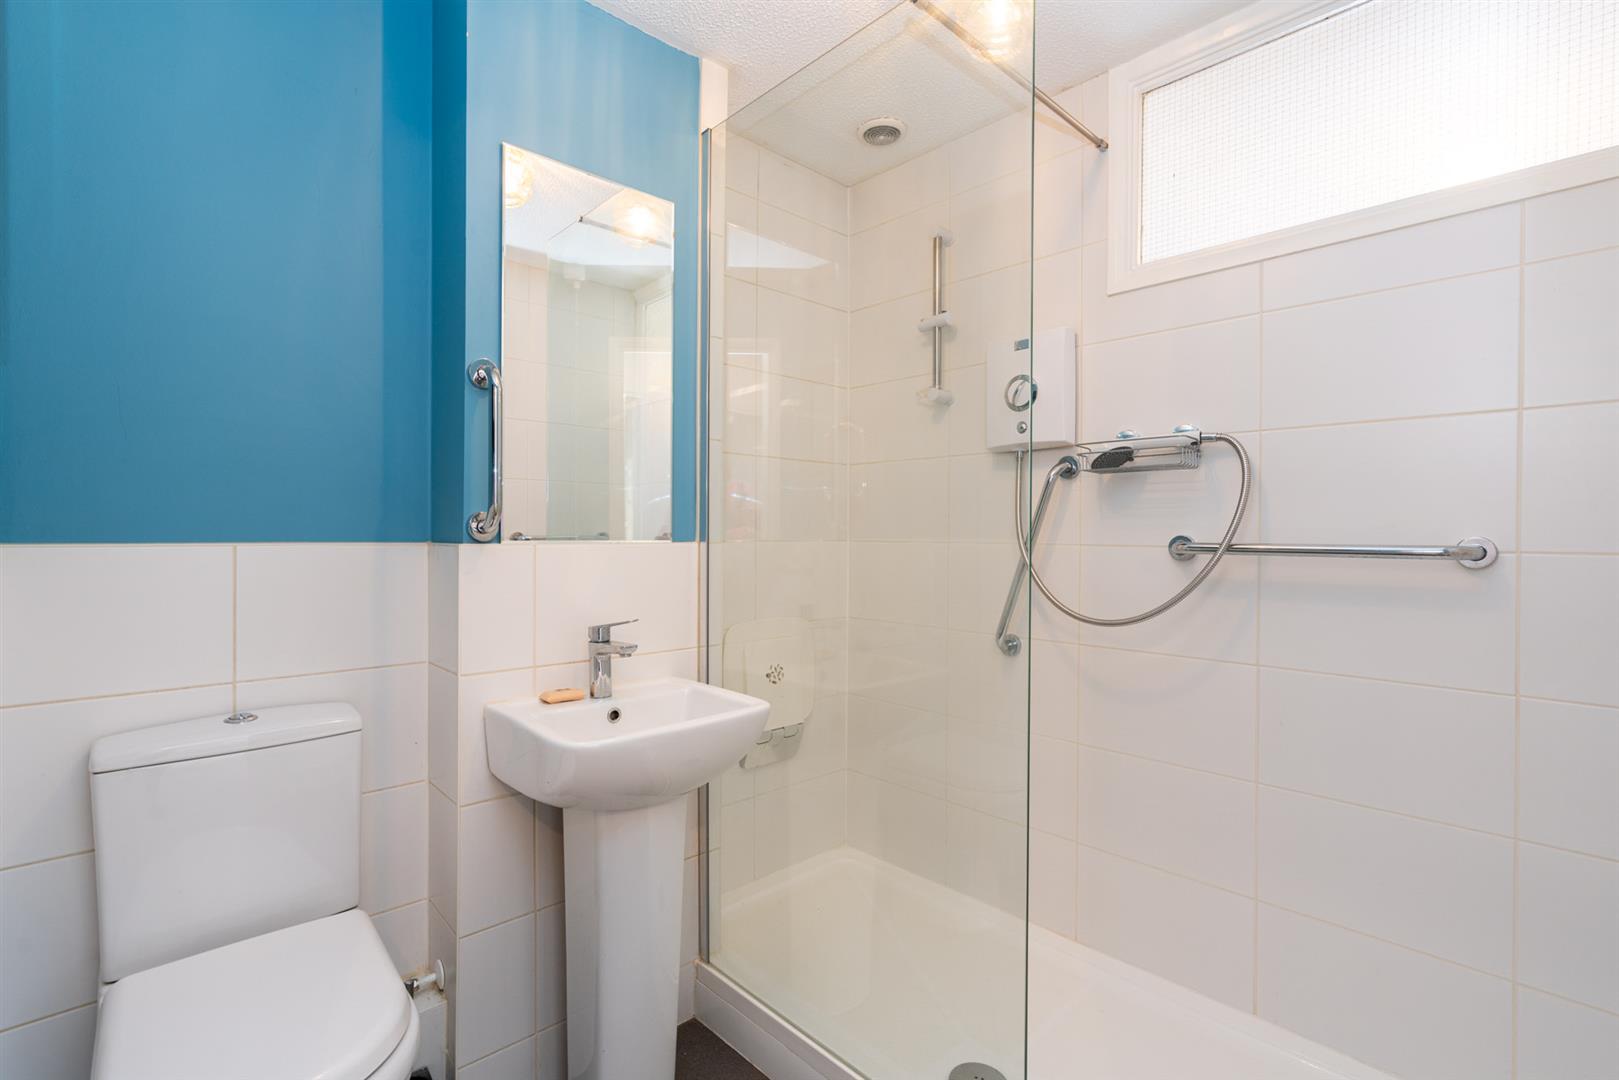 37-Old-Mill-Gardens-2039 - bathroom.jpg